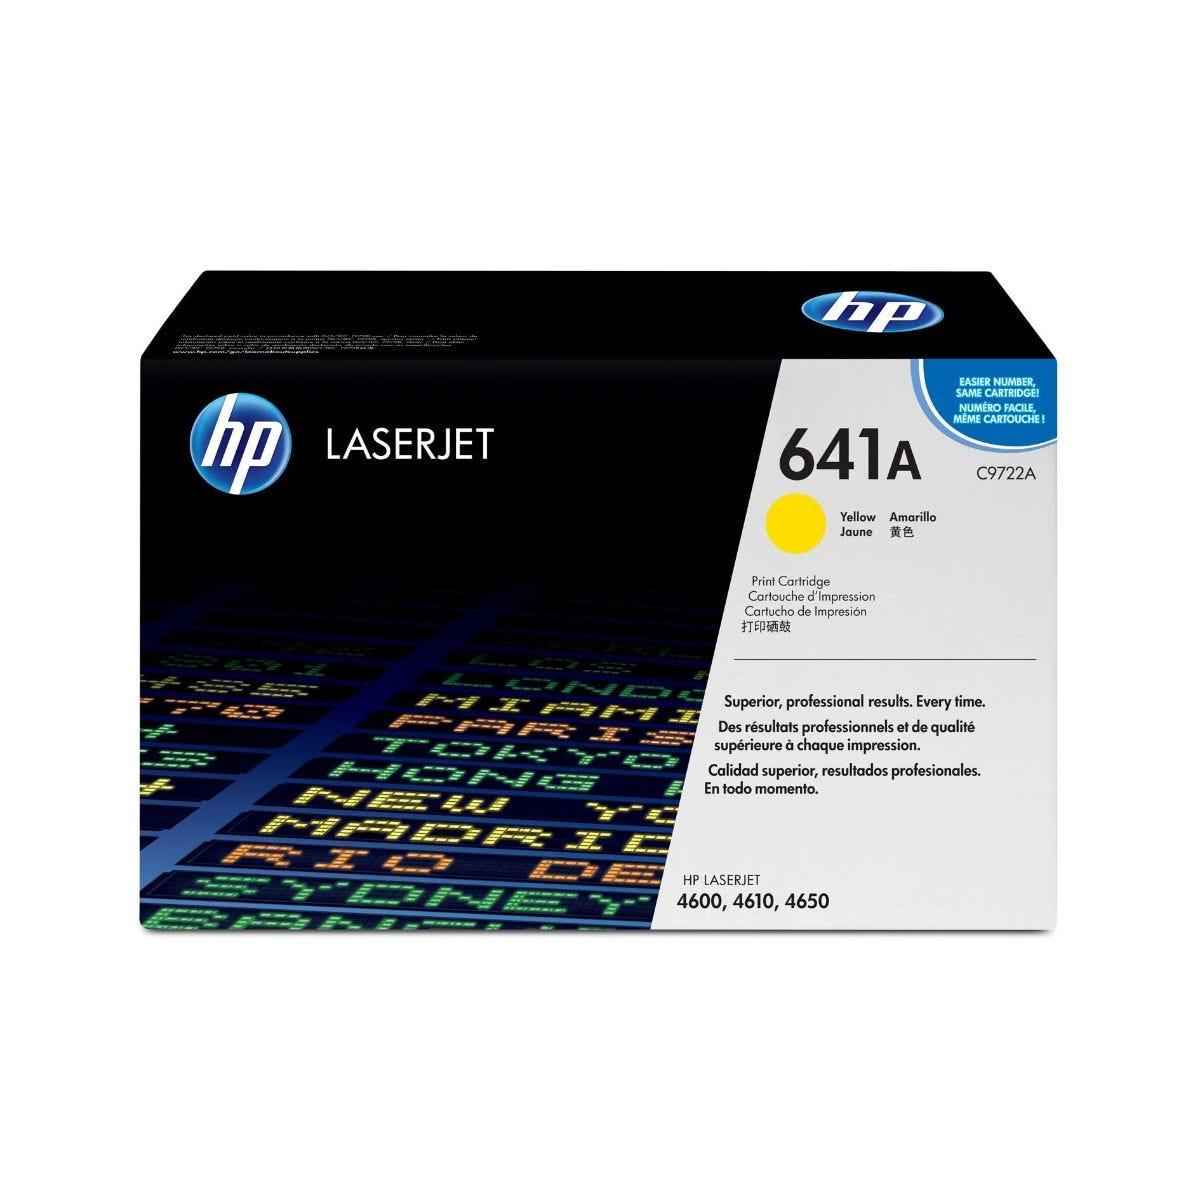 Image of HP 641A Laserjet Ink Toner Cartridge C9722A, Yellow